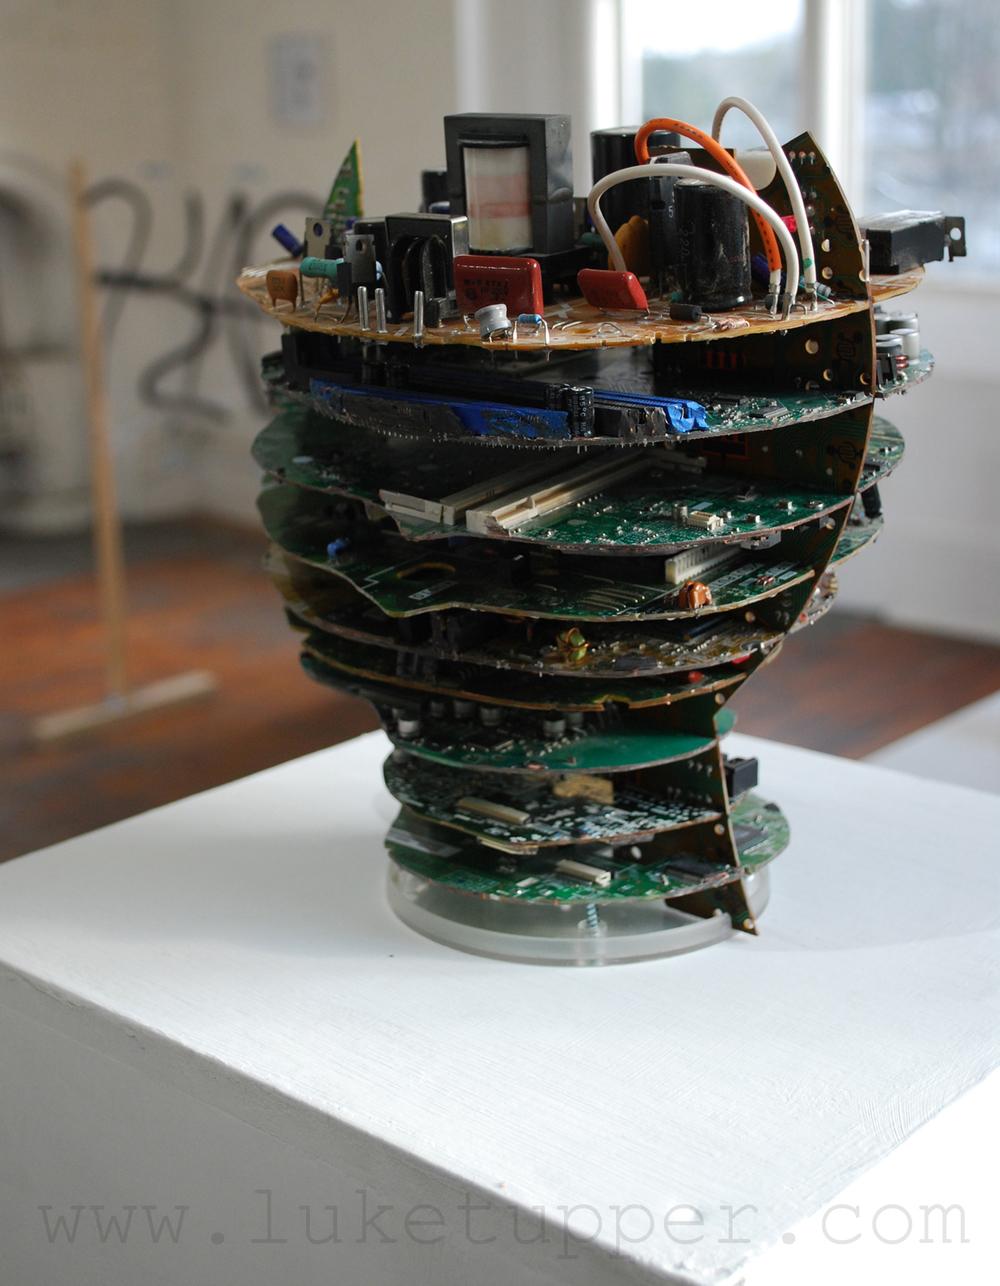 'Compute' 2014 - Luke Tupper